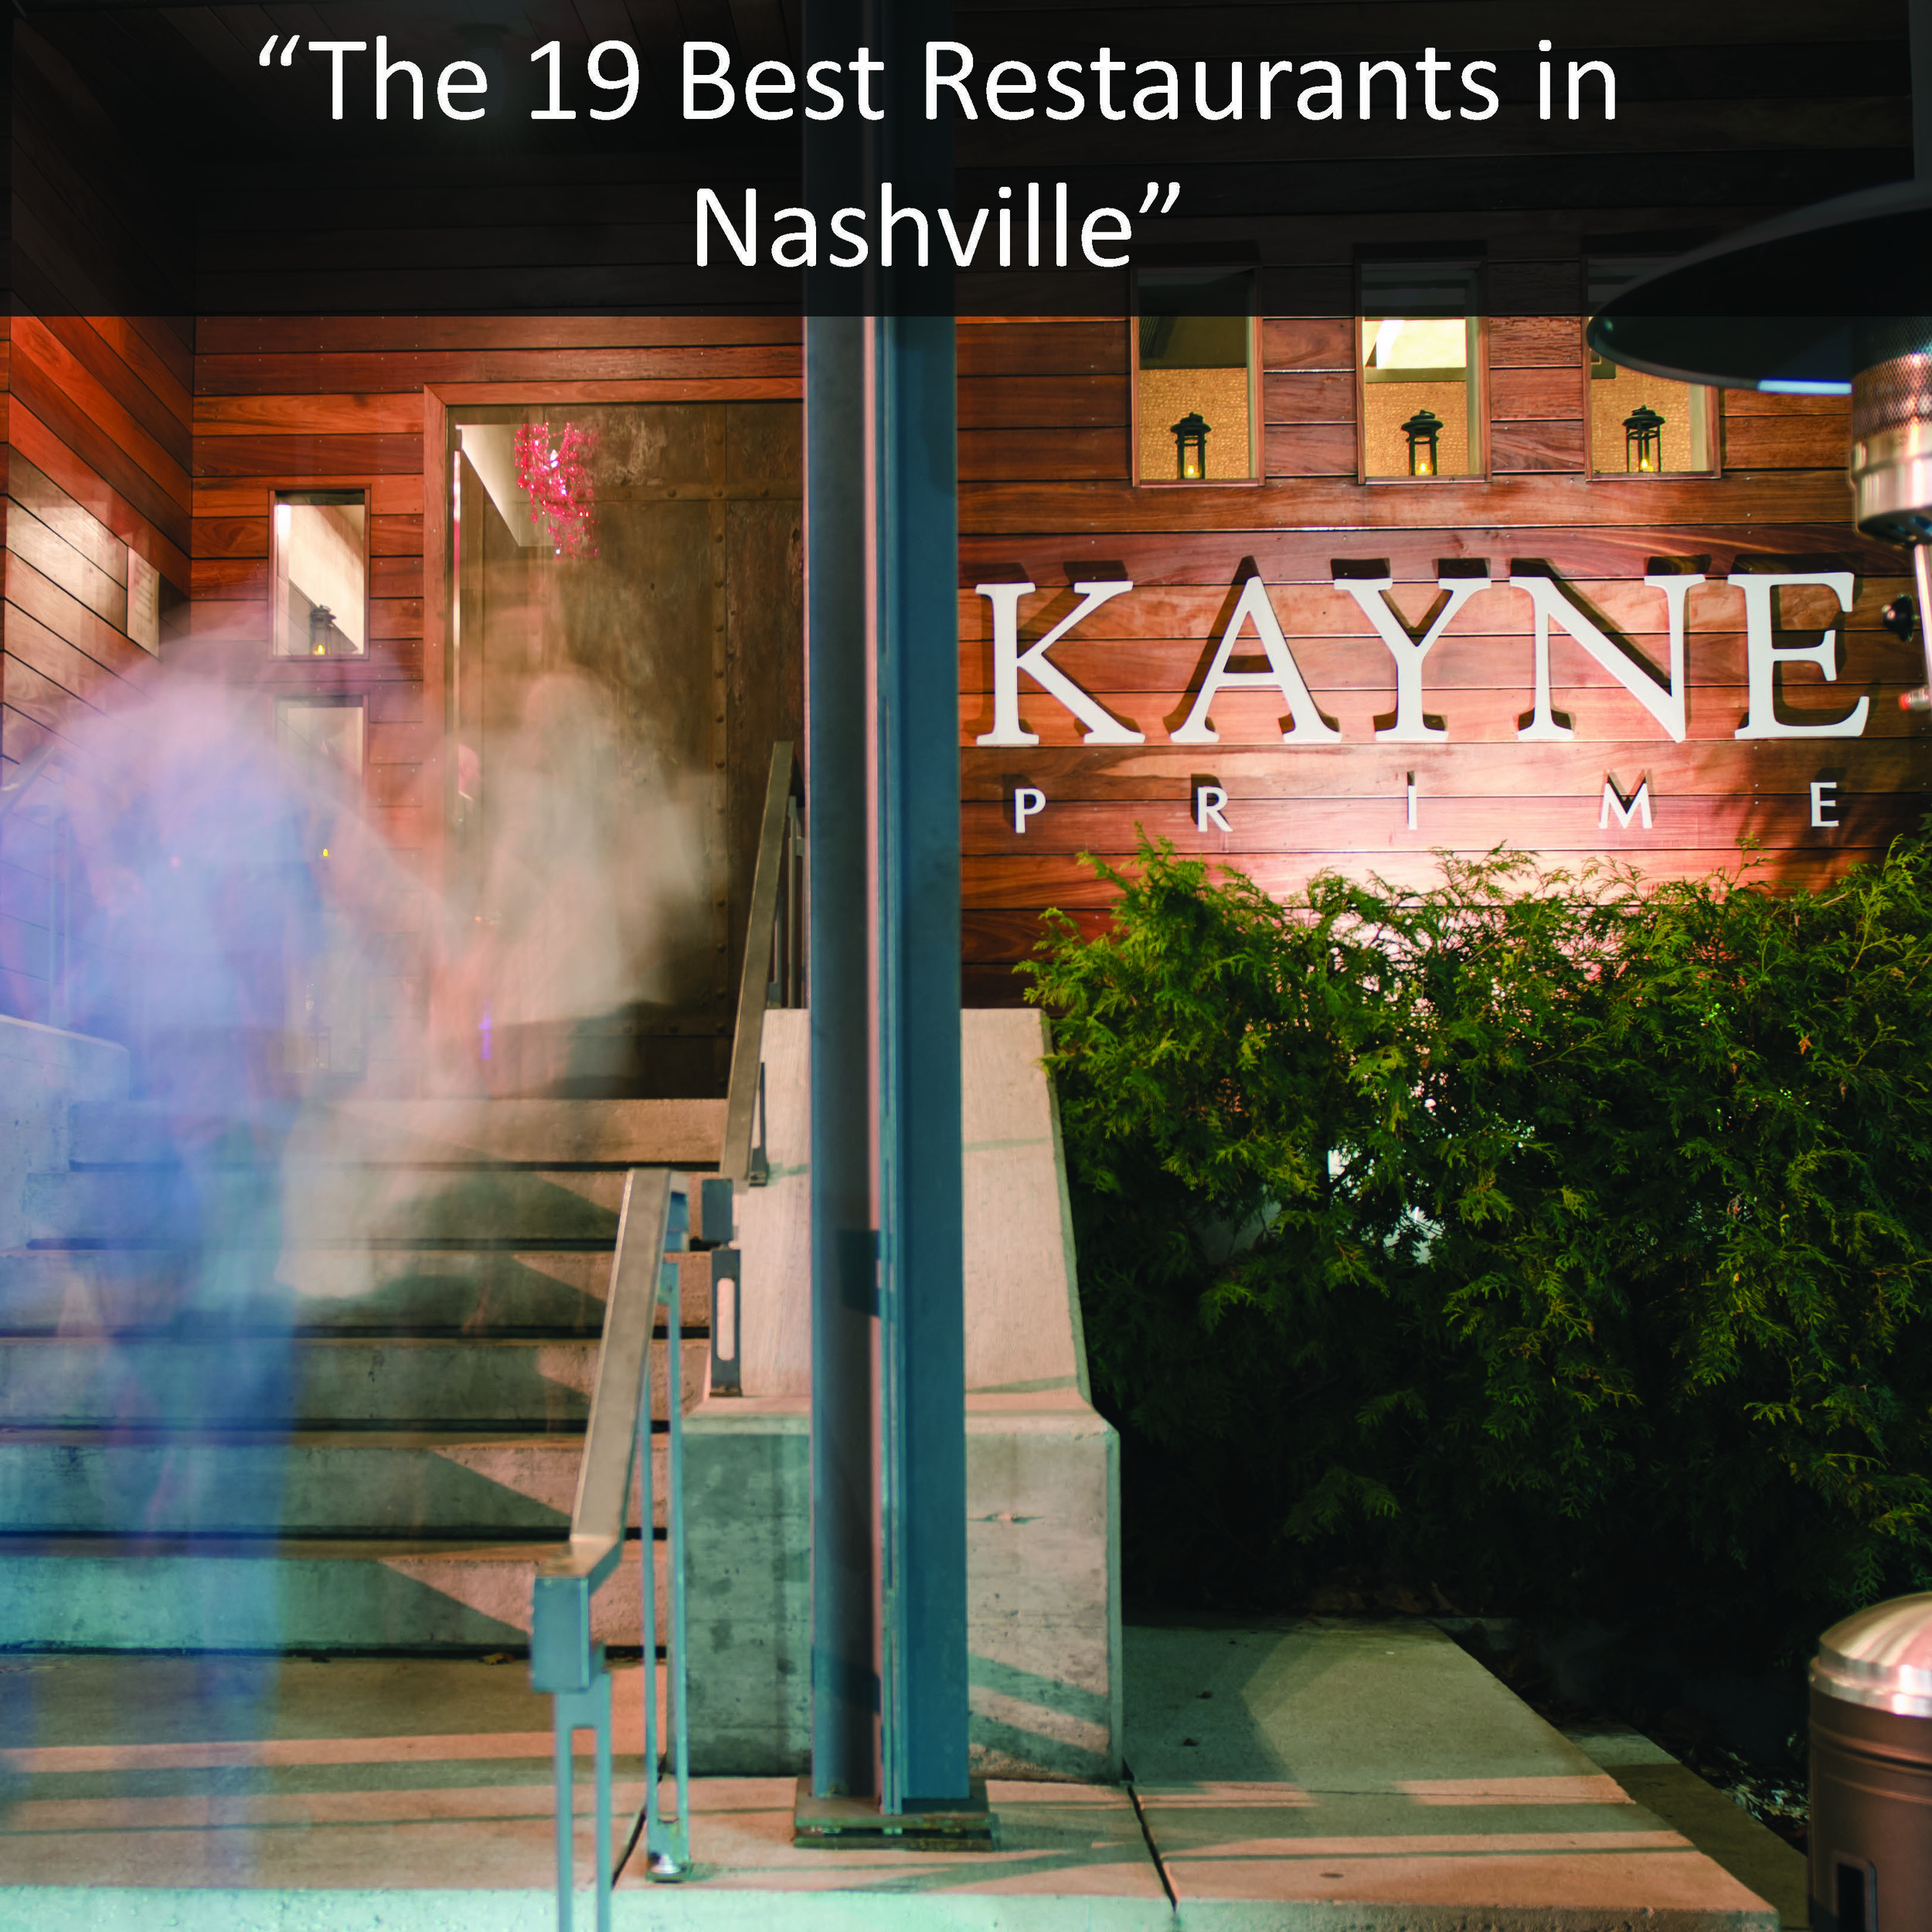 The 19 Best Restaurants in Nashville